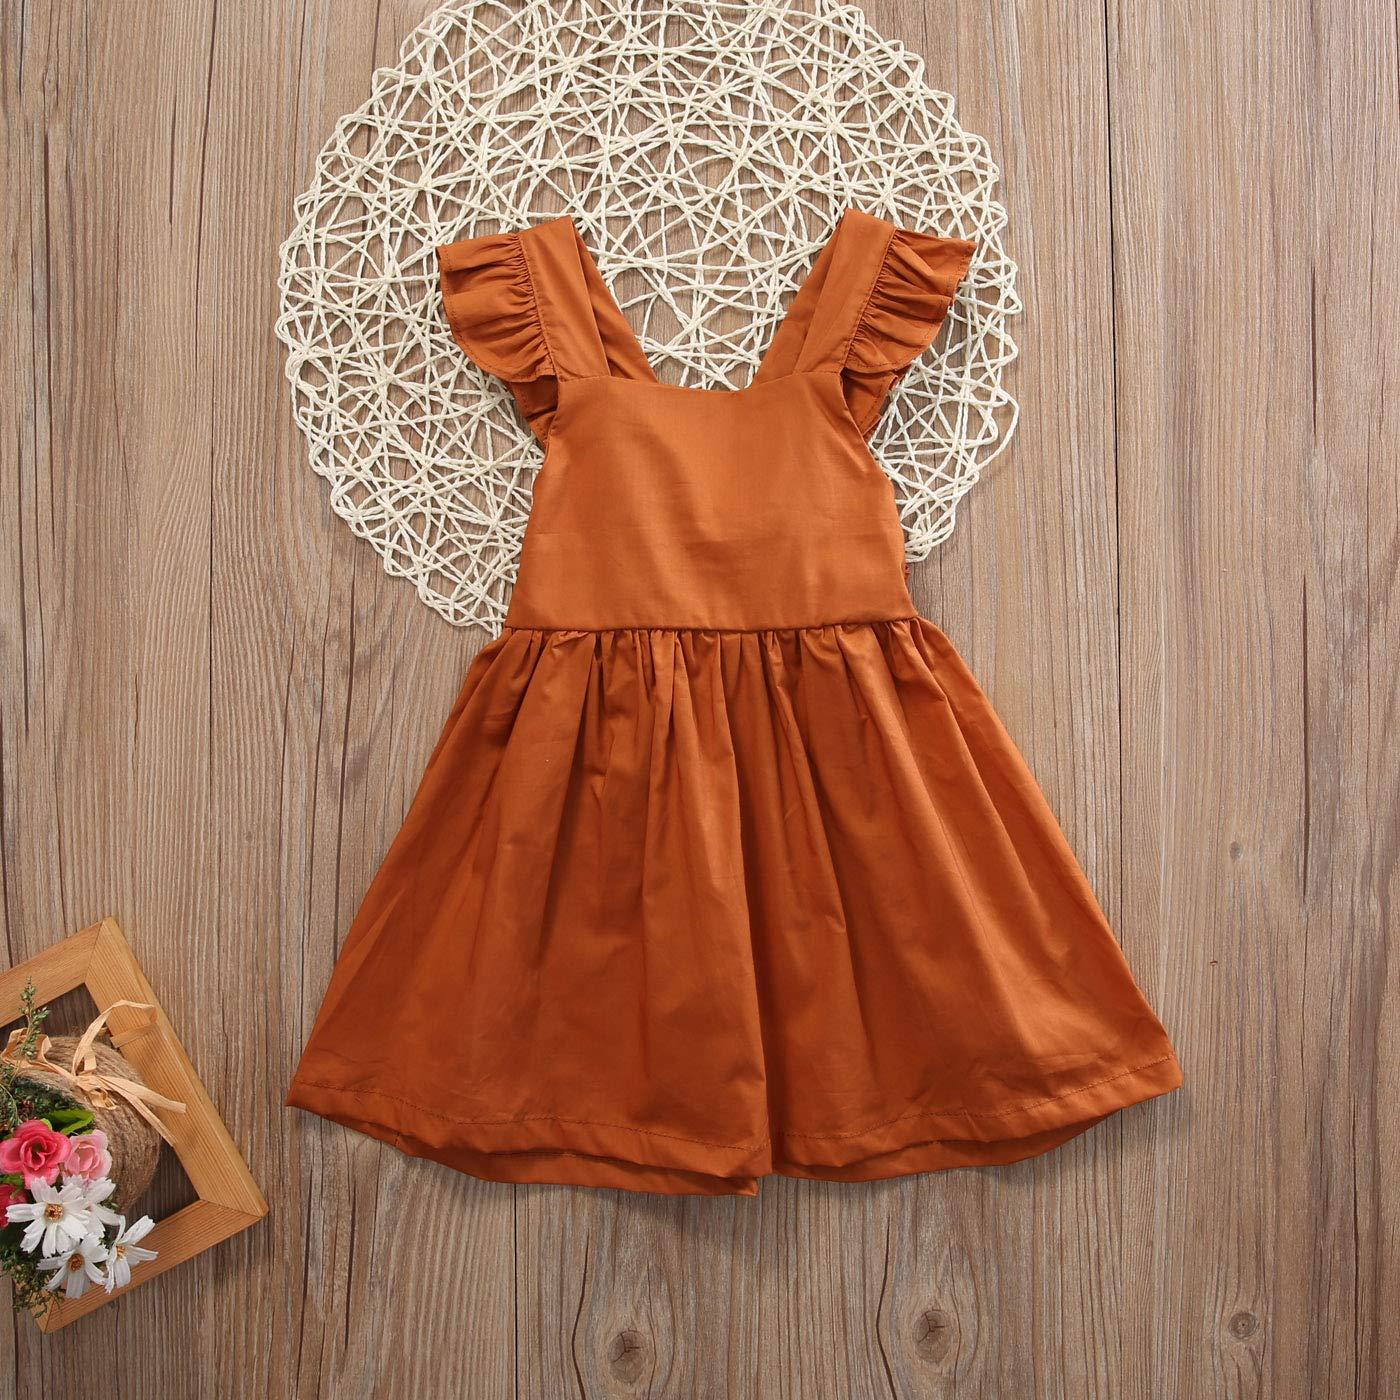 Mericiny Newborn Baby Girls Infant Bowknot Dress Sleeveless Ruffled Solid Coffee Dresses